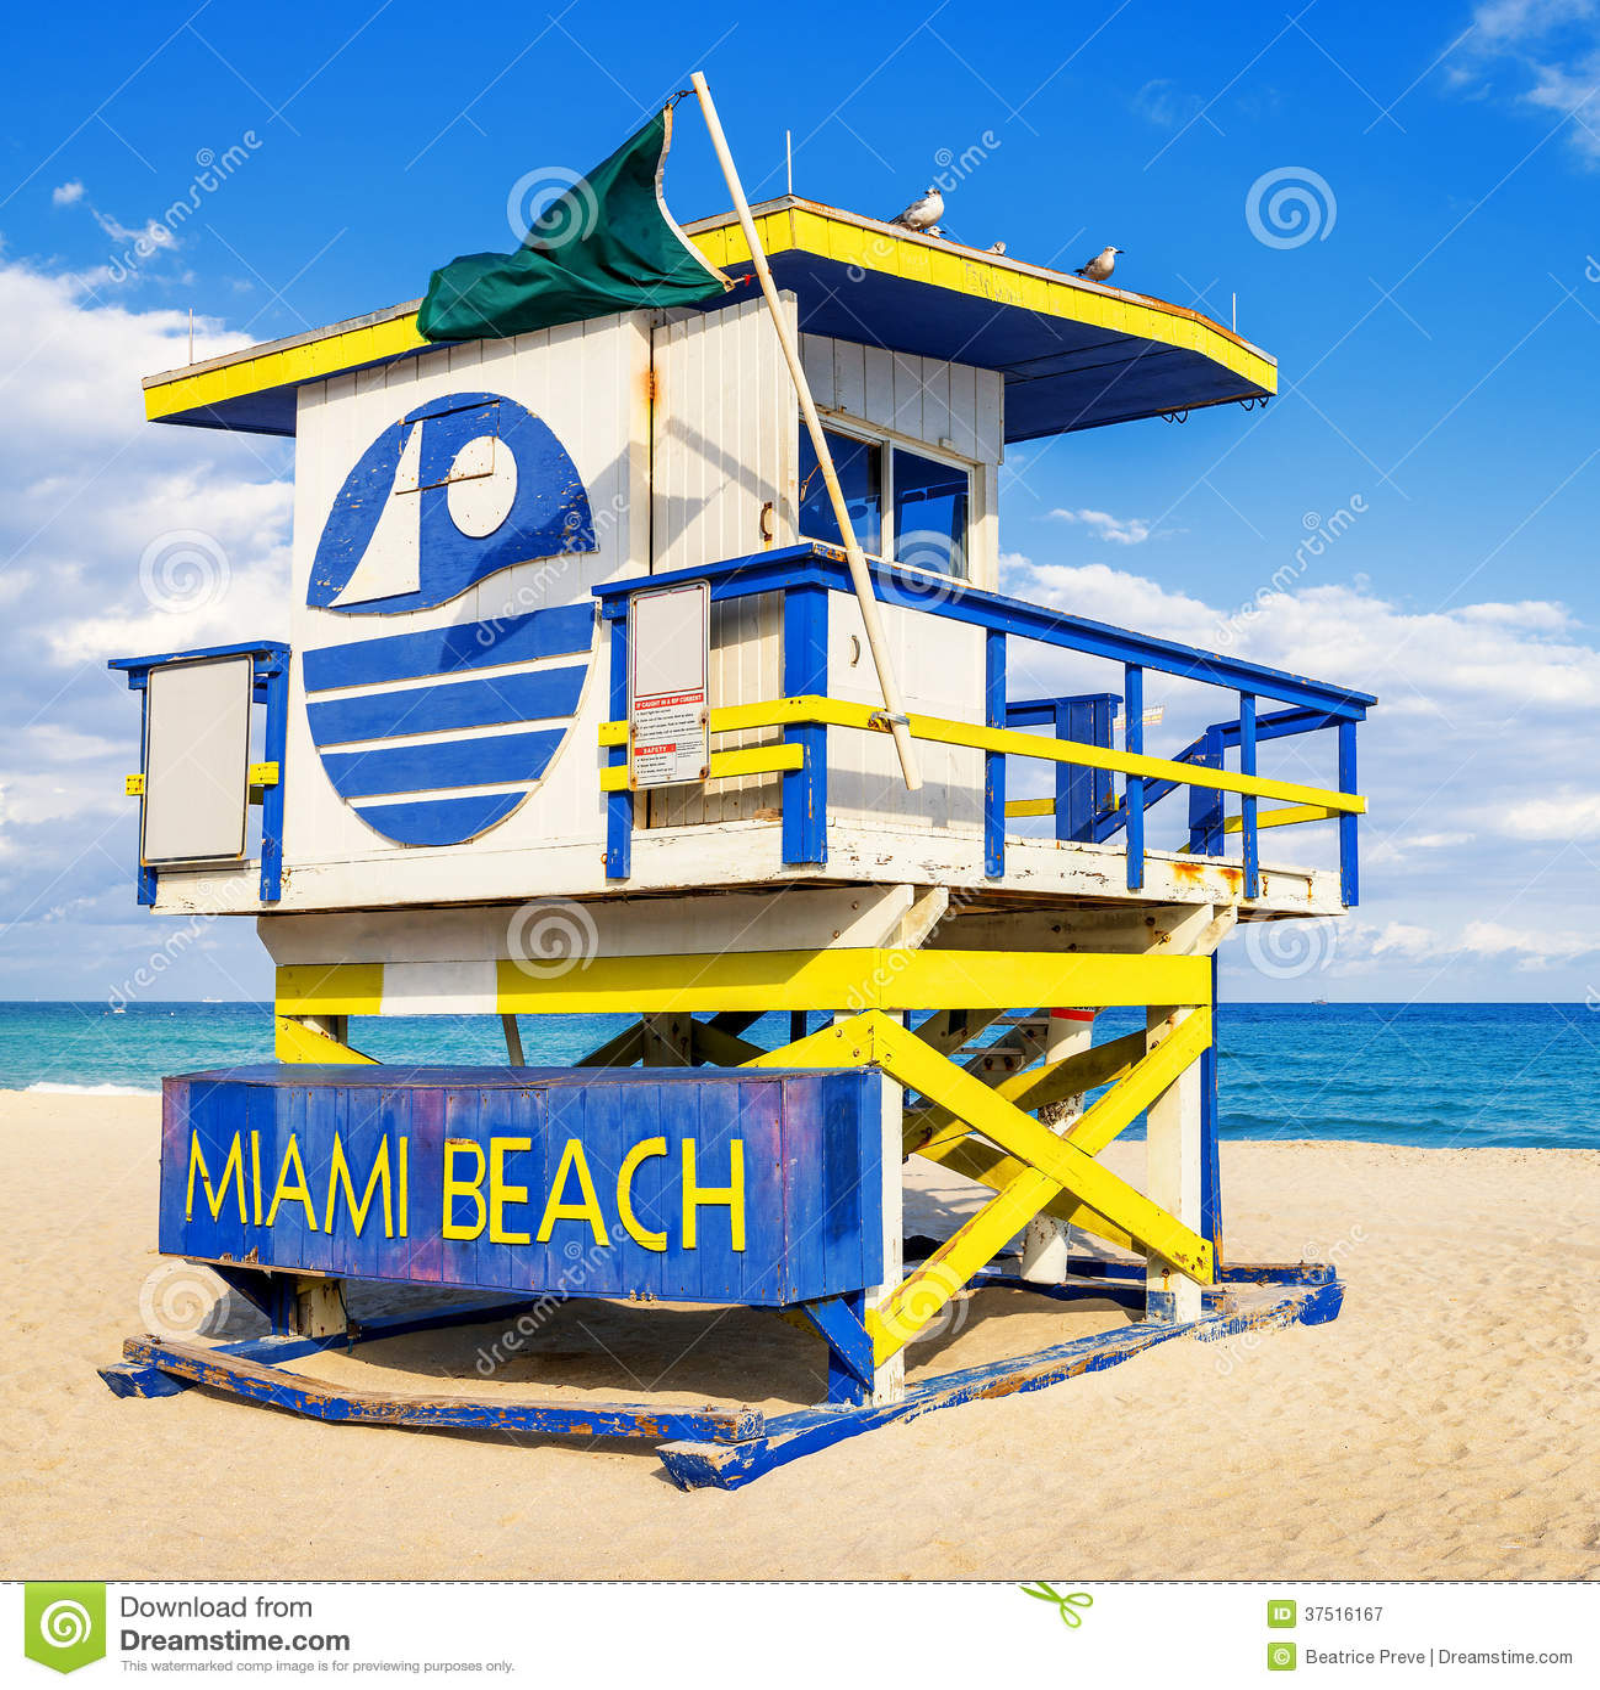 Miami Beach Lifeguard Stands